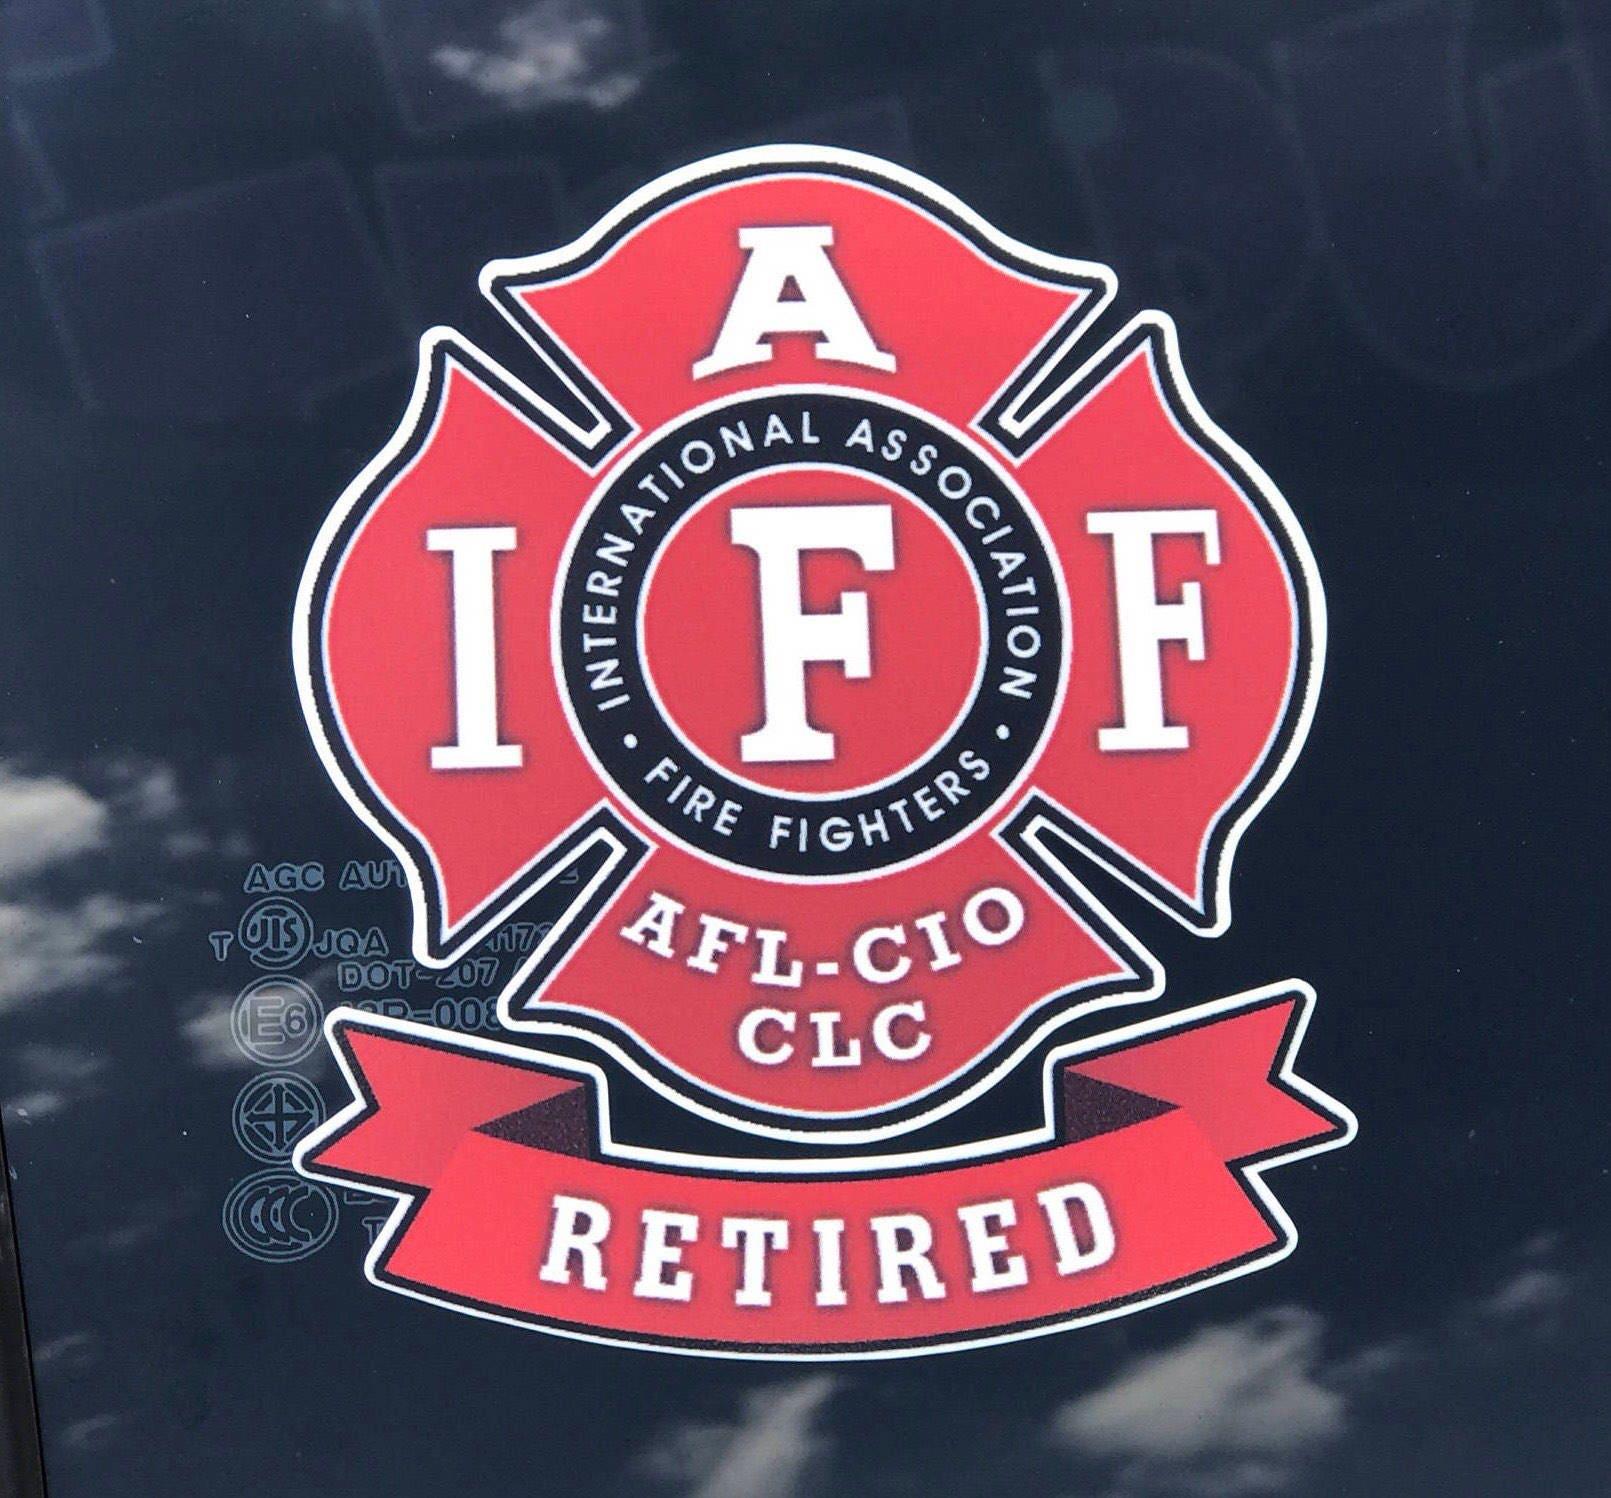 IAFF, Fire Fighters Retired Maltese Cross IAFF Logo Decal